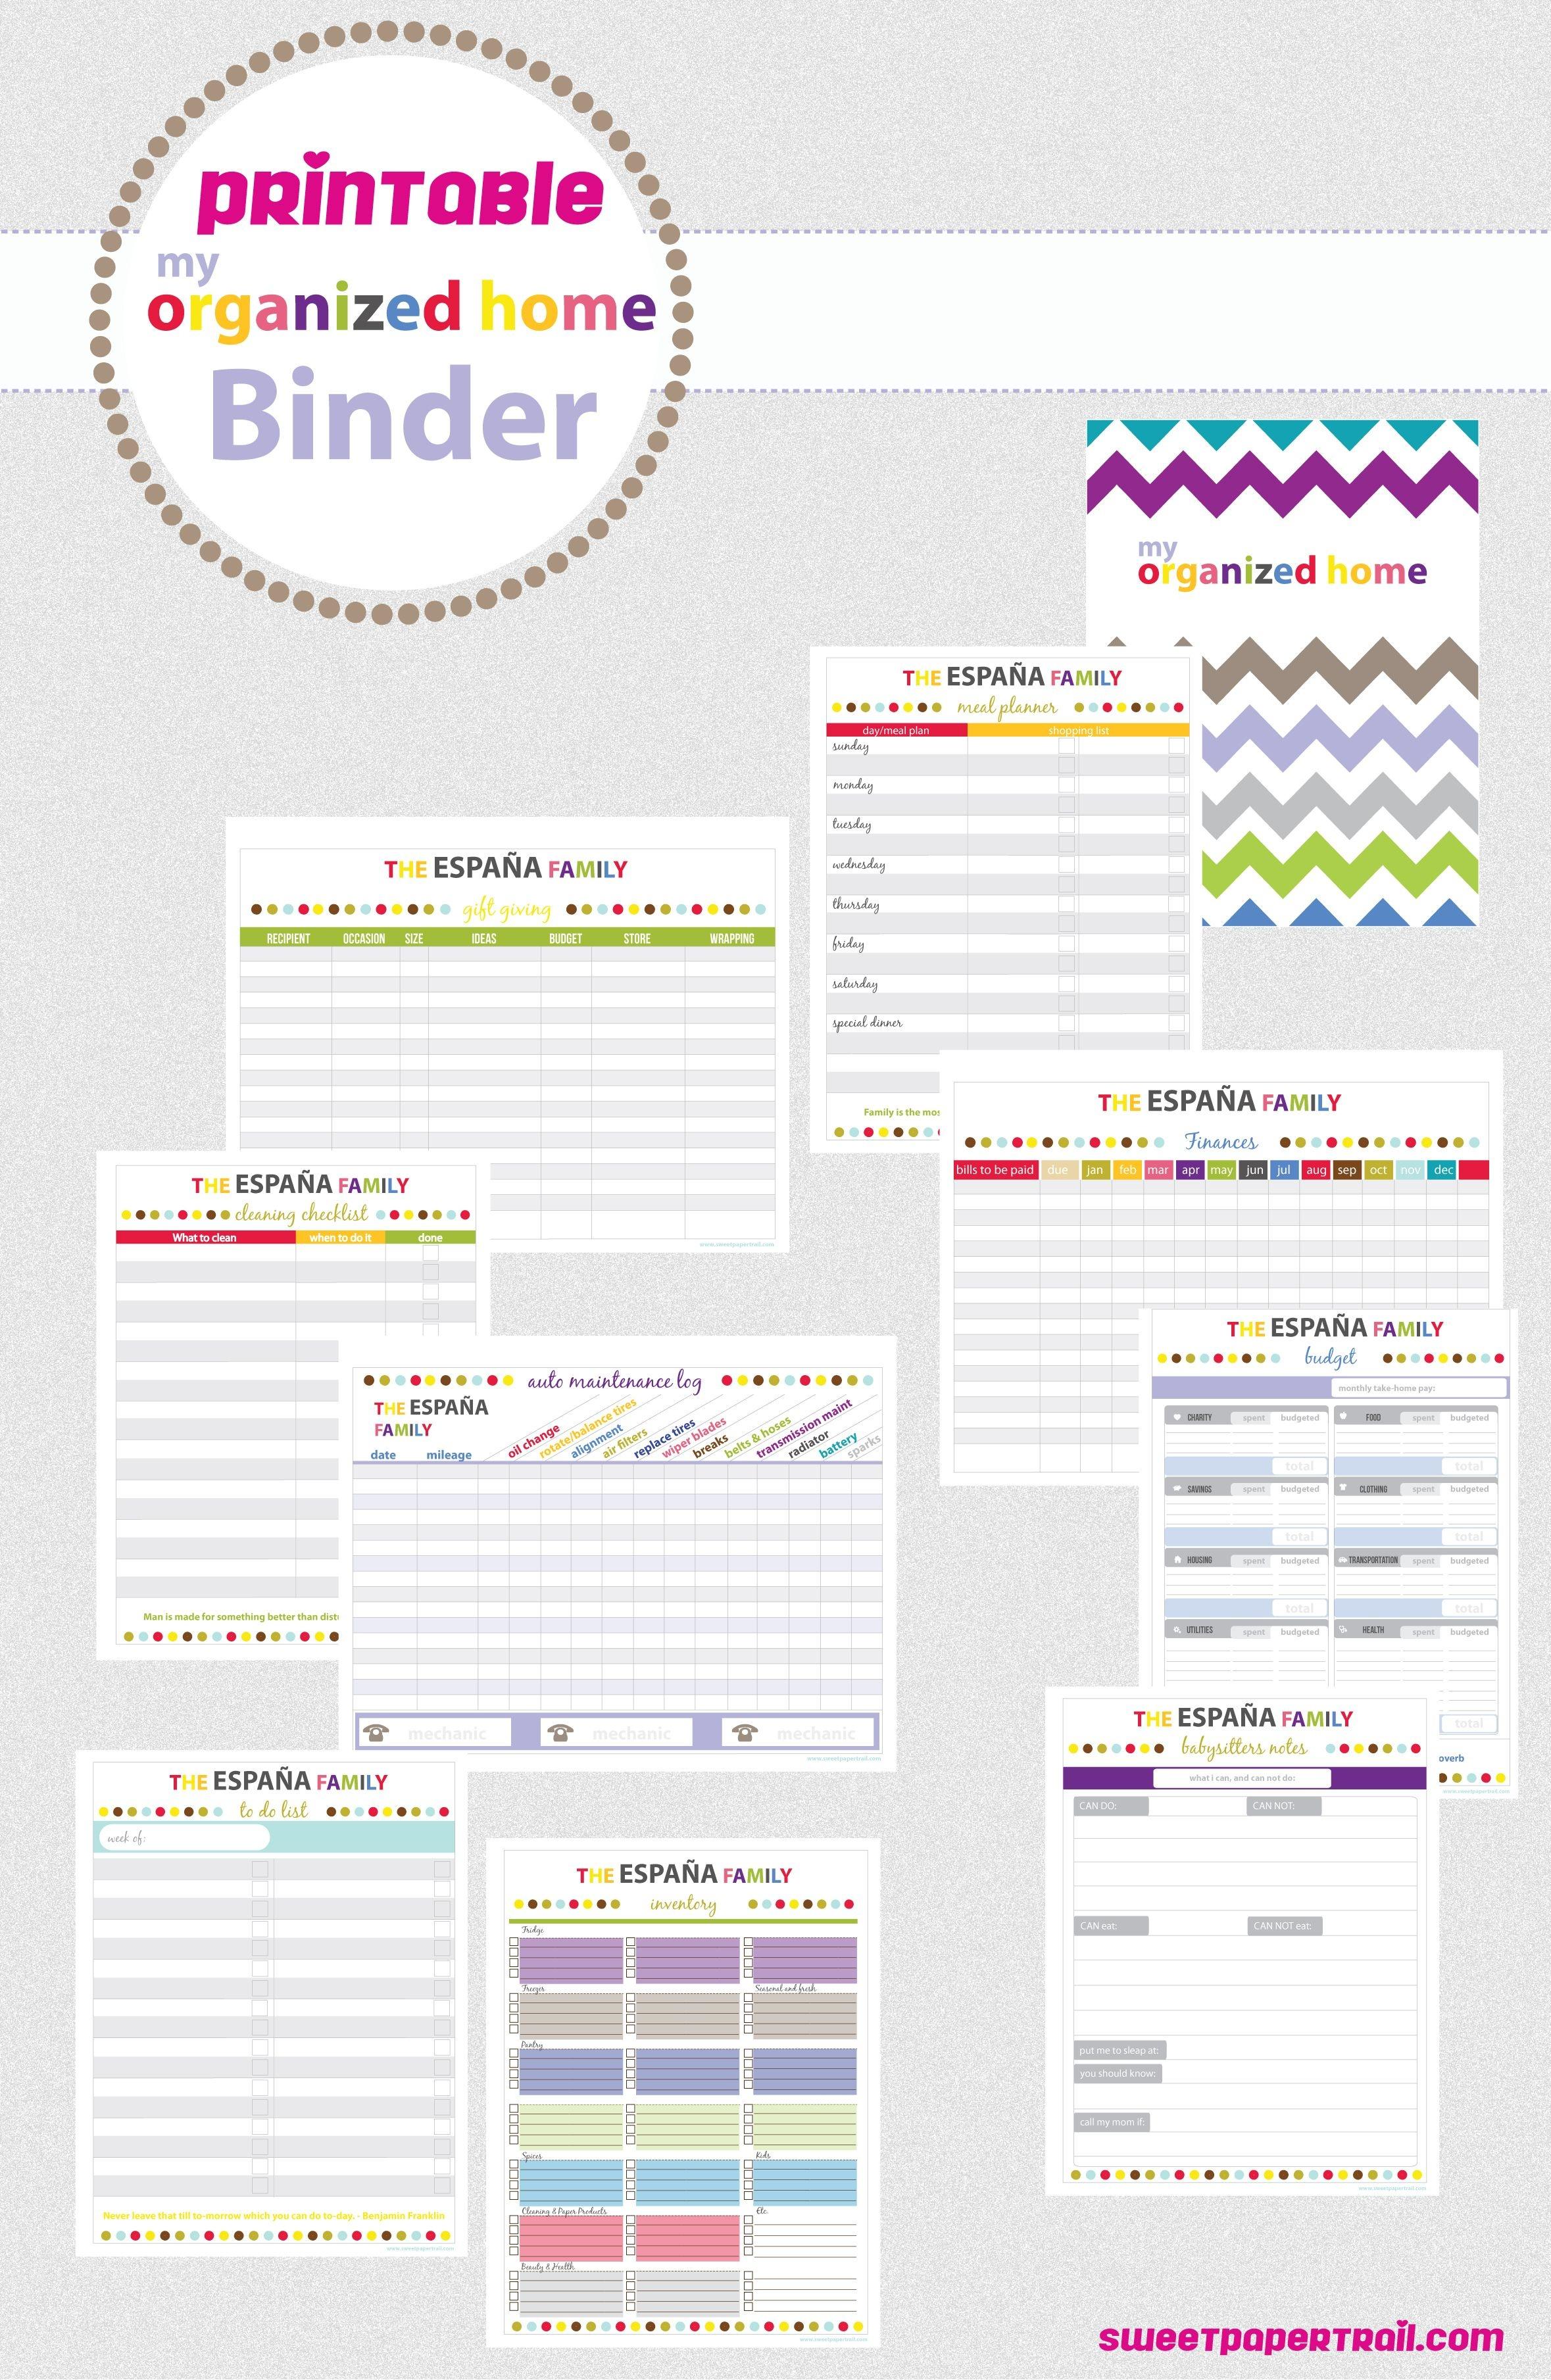 Printable 2013 Planner | Budget | Binder Organization, Home - Free Printable Home Organizer Notebook